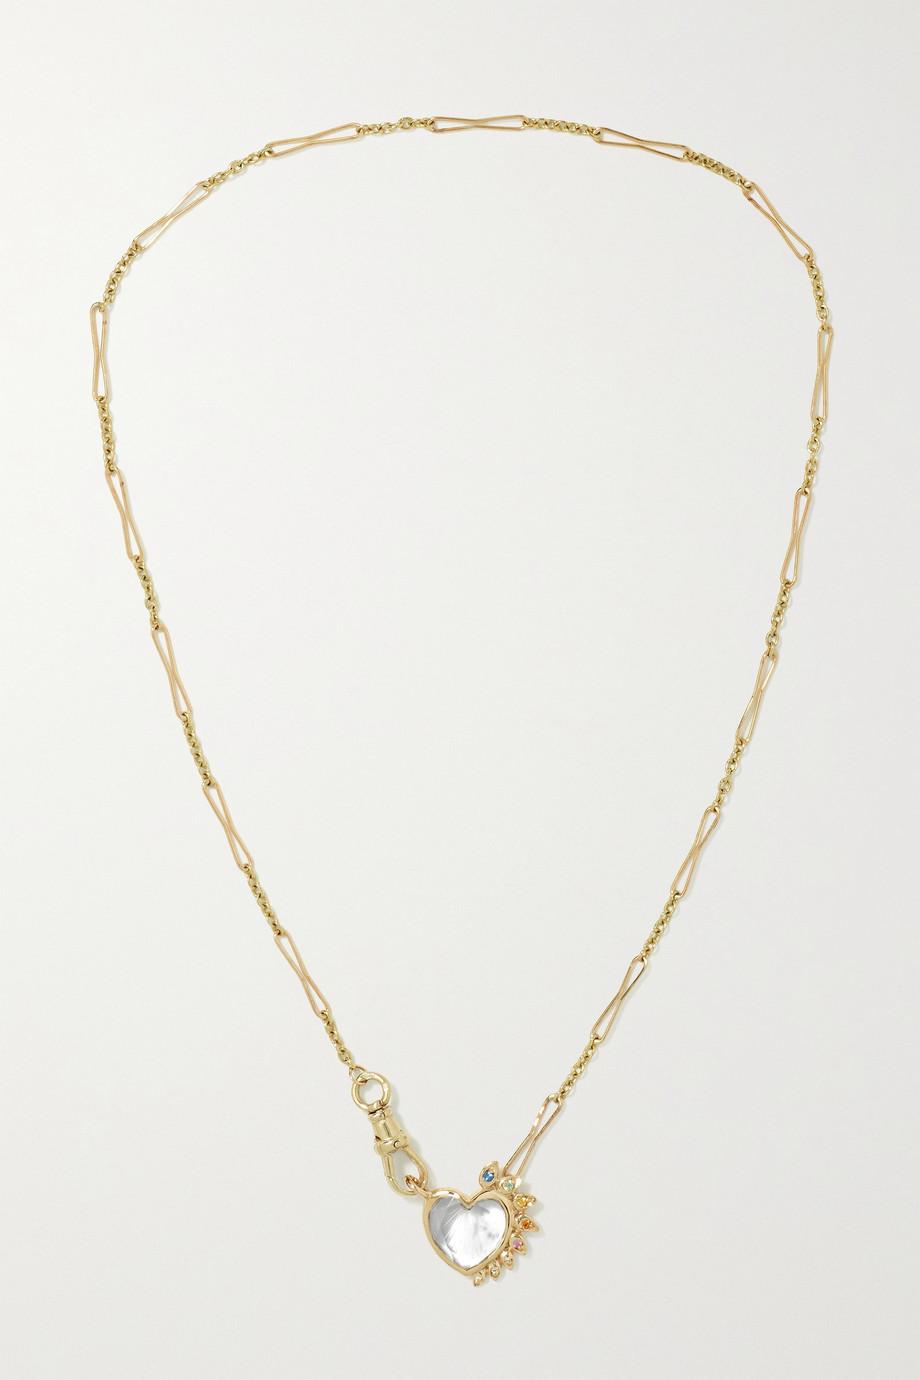 Pascale Monvoisin Gabin N°4 9-karat gold multi-stone necklace